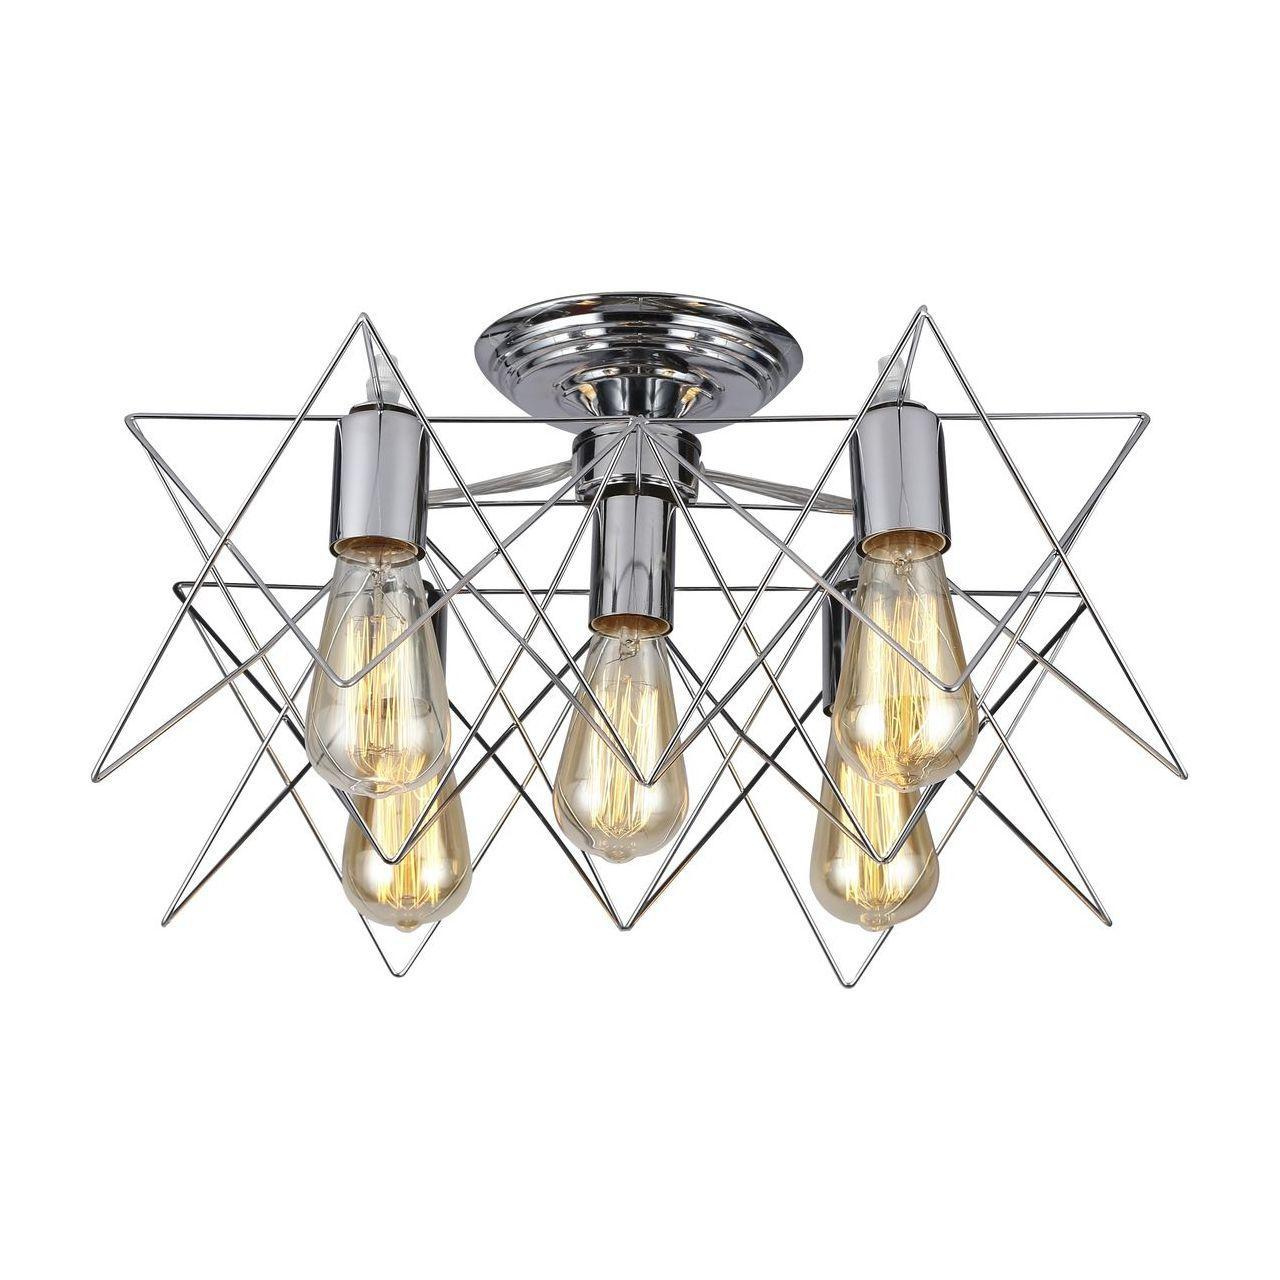 Люстра Arte Lamp A6048PL-5CC потолочная цена